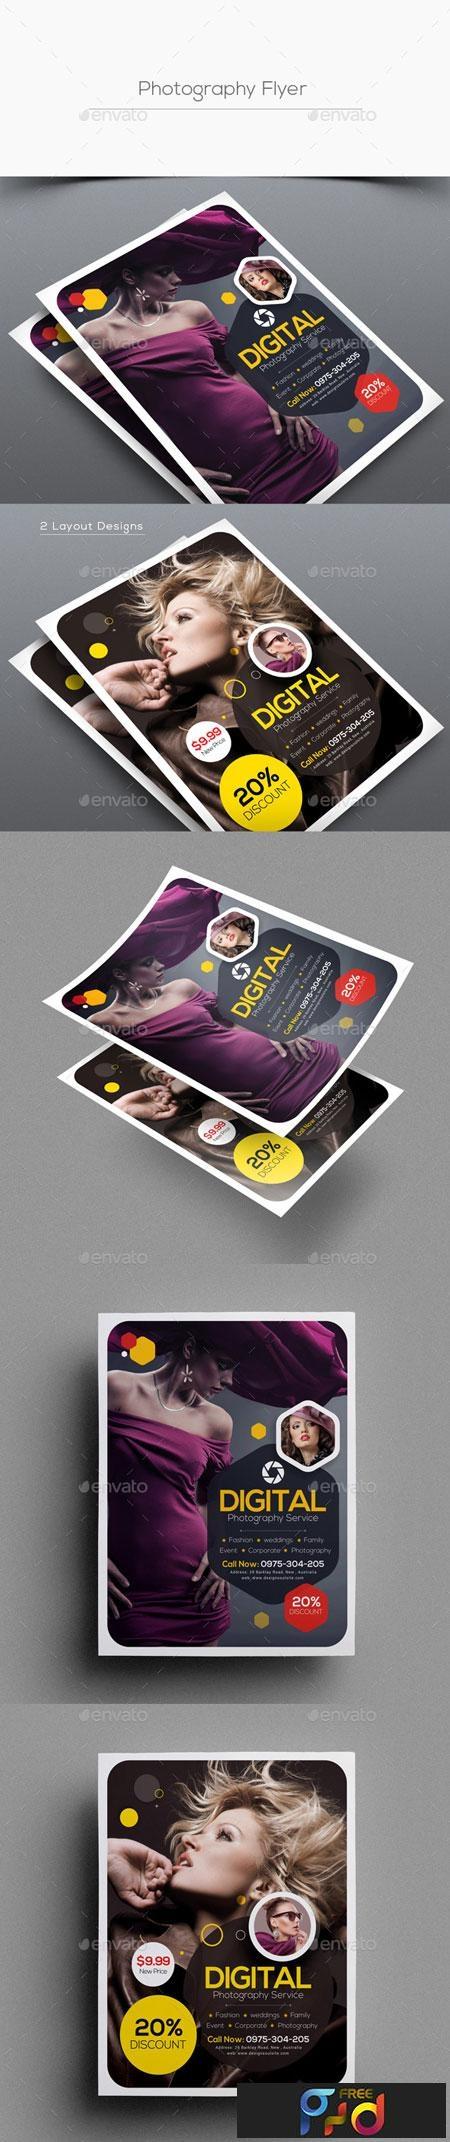 Photography Flyer 22588028 1